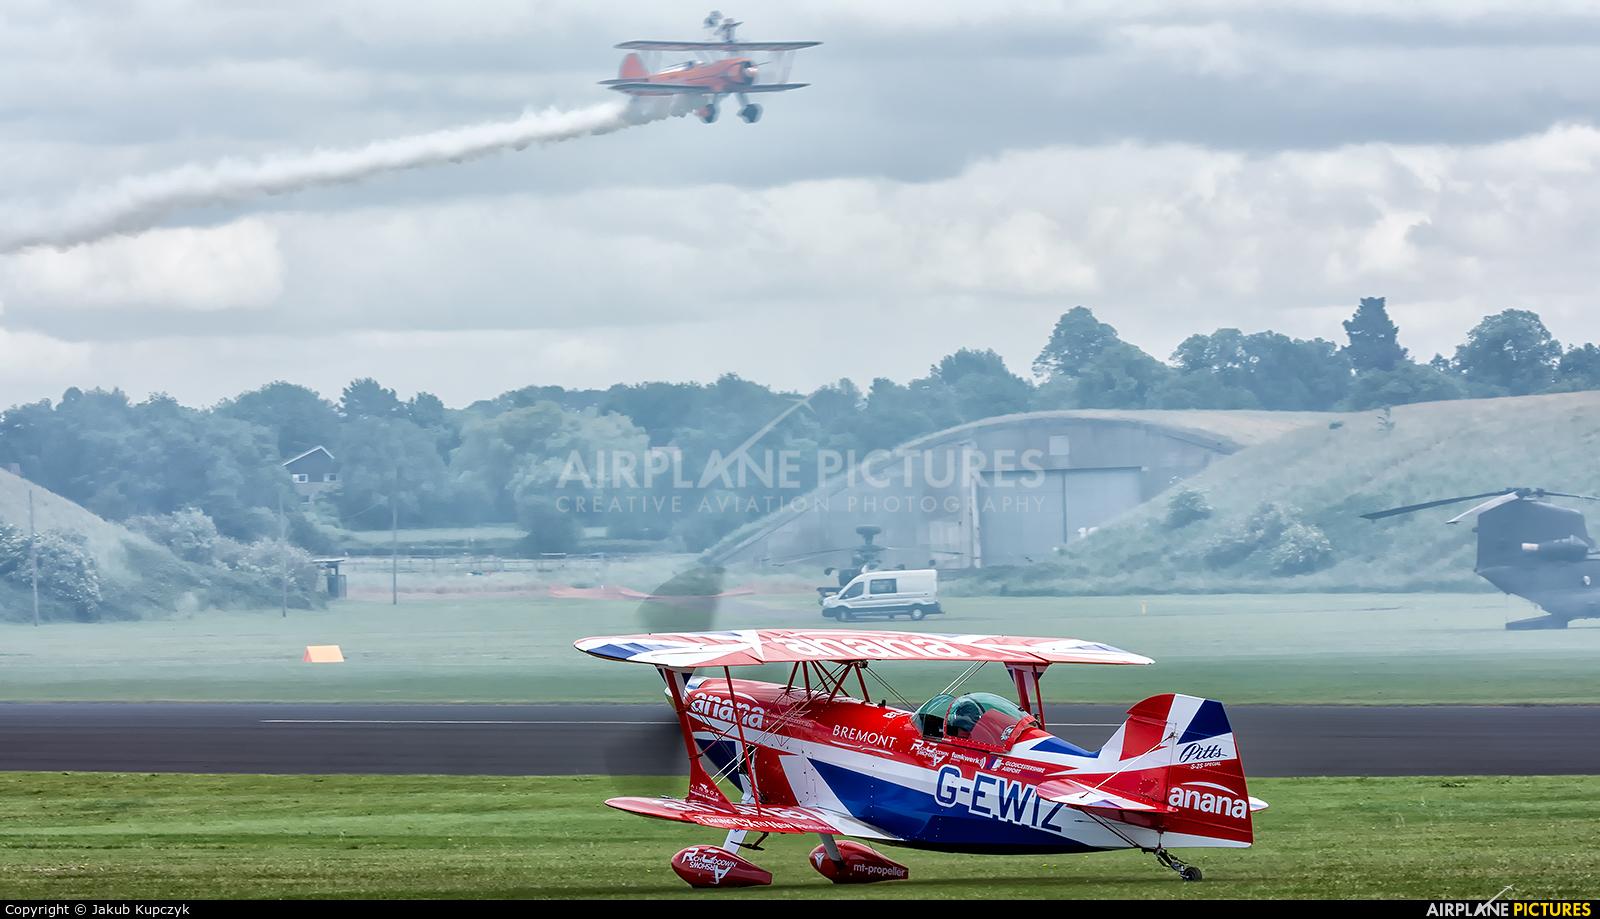 Rich Goodwin Airshows G-EWIZ aircraft at Cosford